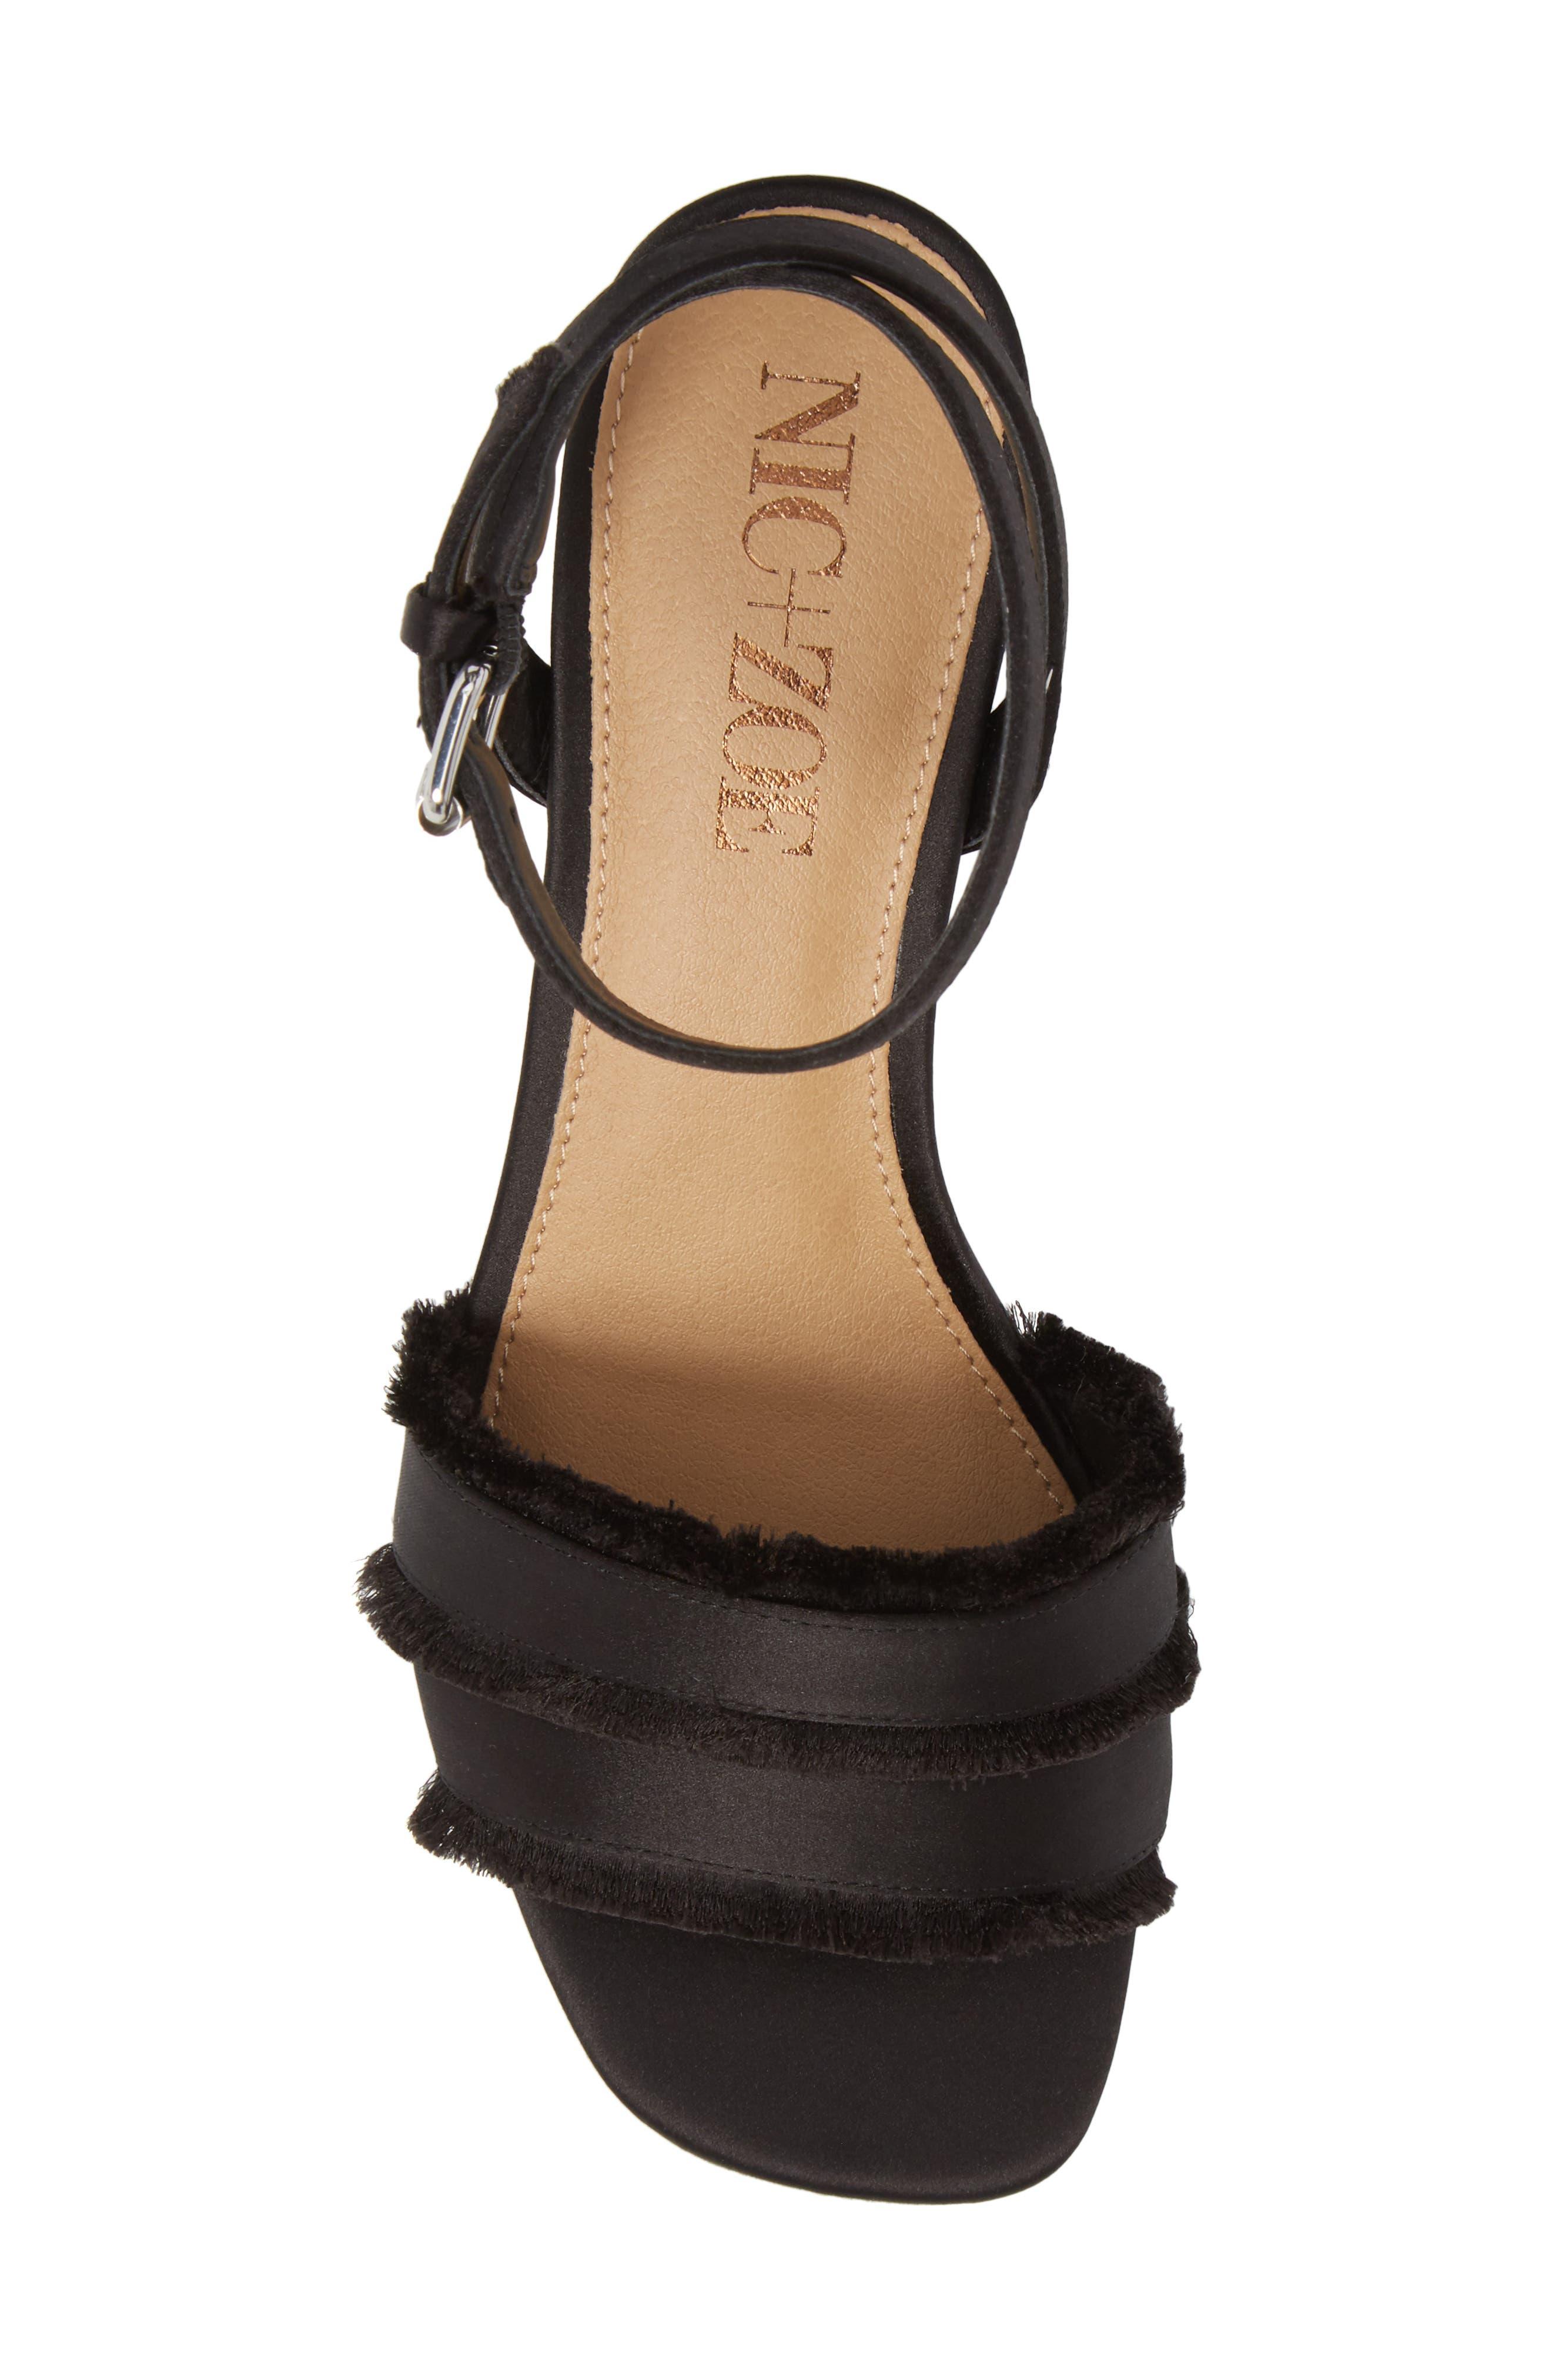 Zaria Fringed Sandal,                             Alternate thumbnail 5, color,                             BLACK SATIN